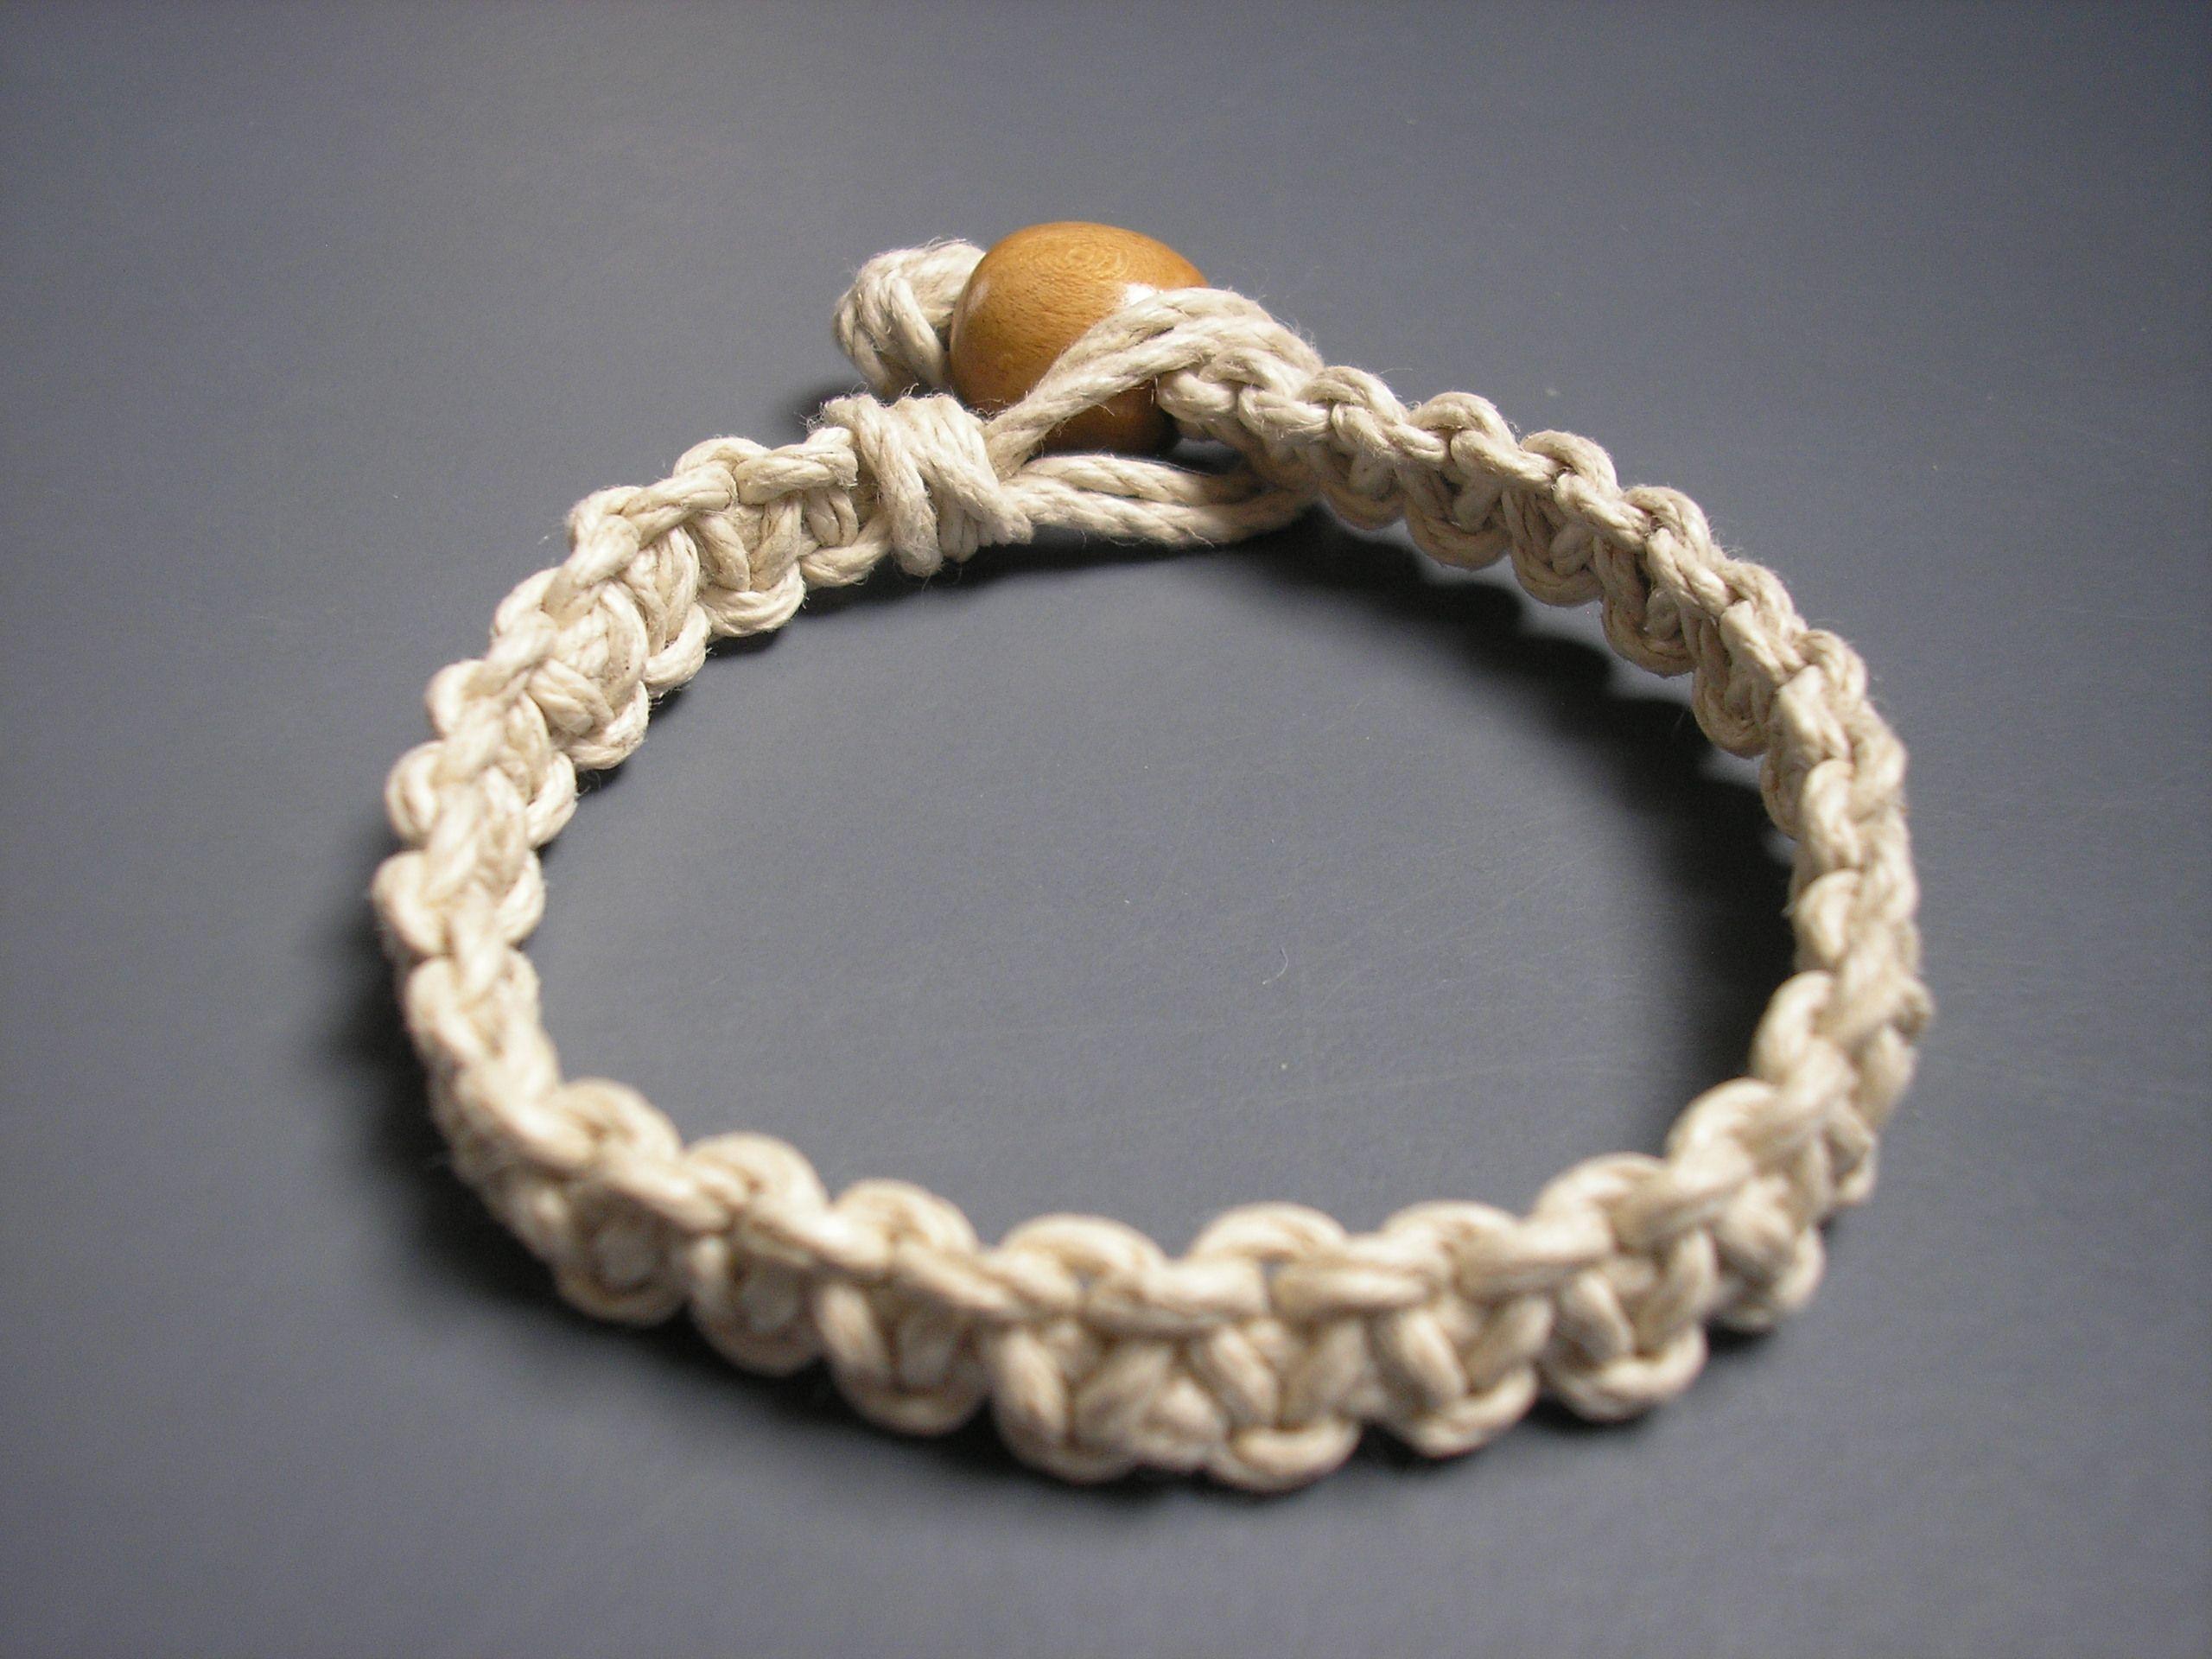 Originaljpg hobbies pinterest hemp jewelry